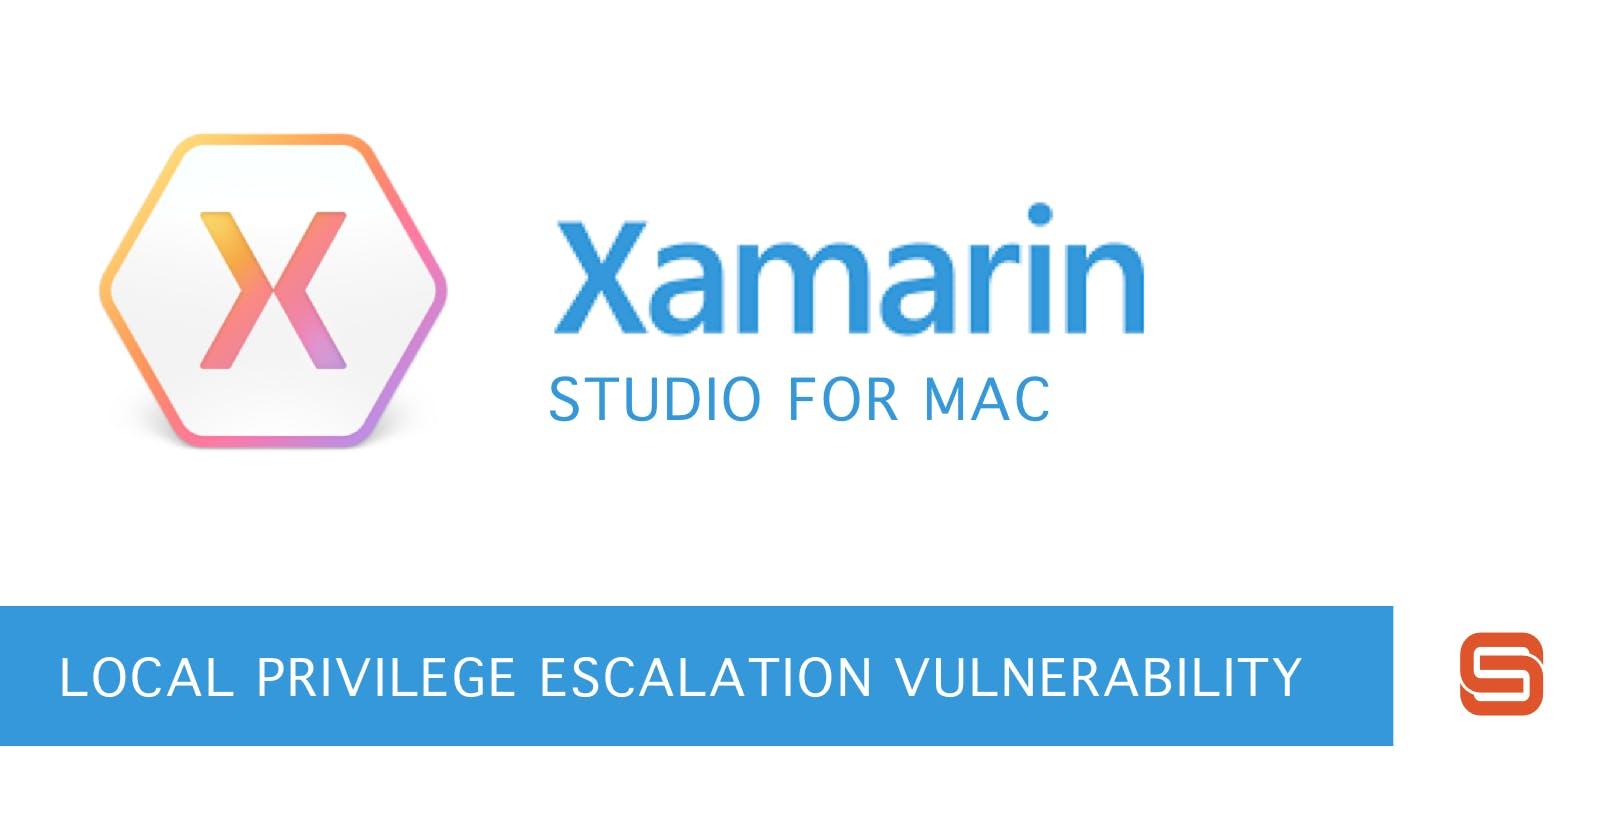 Xamarin Studio for Mac API documentation update affected by local privilege escalation